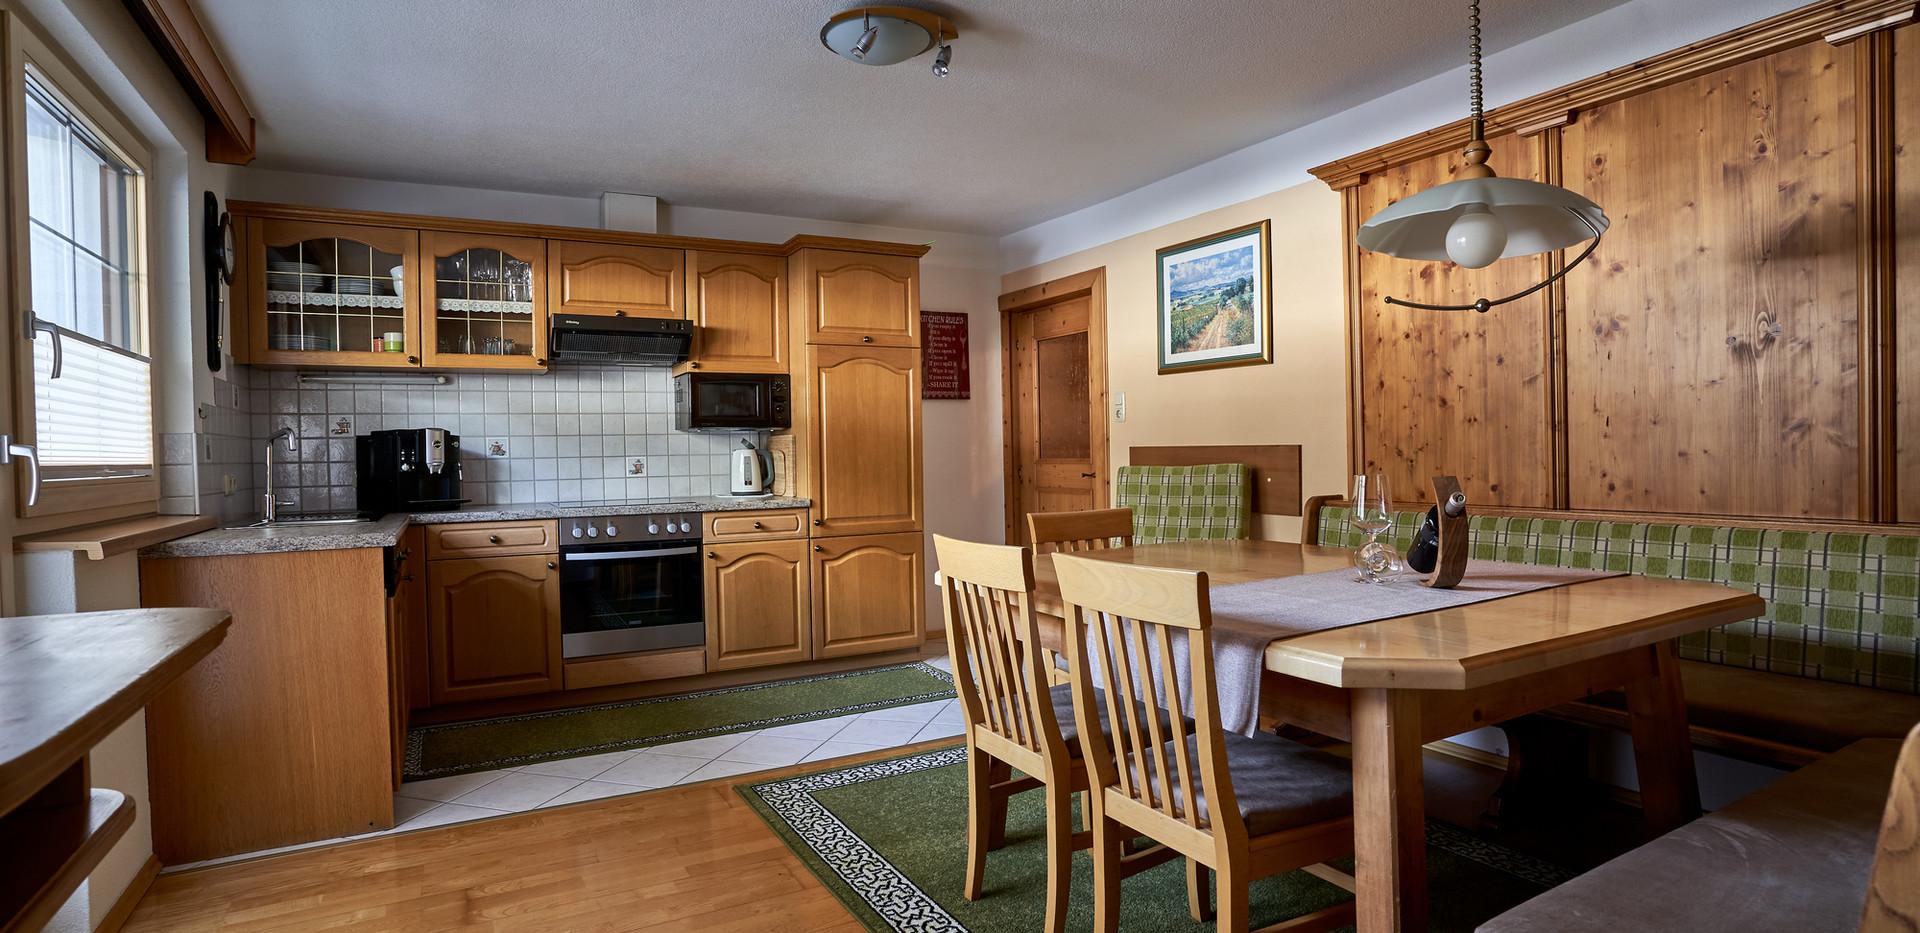 Wohnküche a .jpg